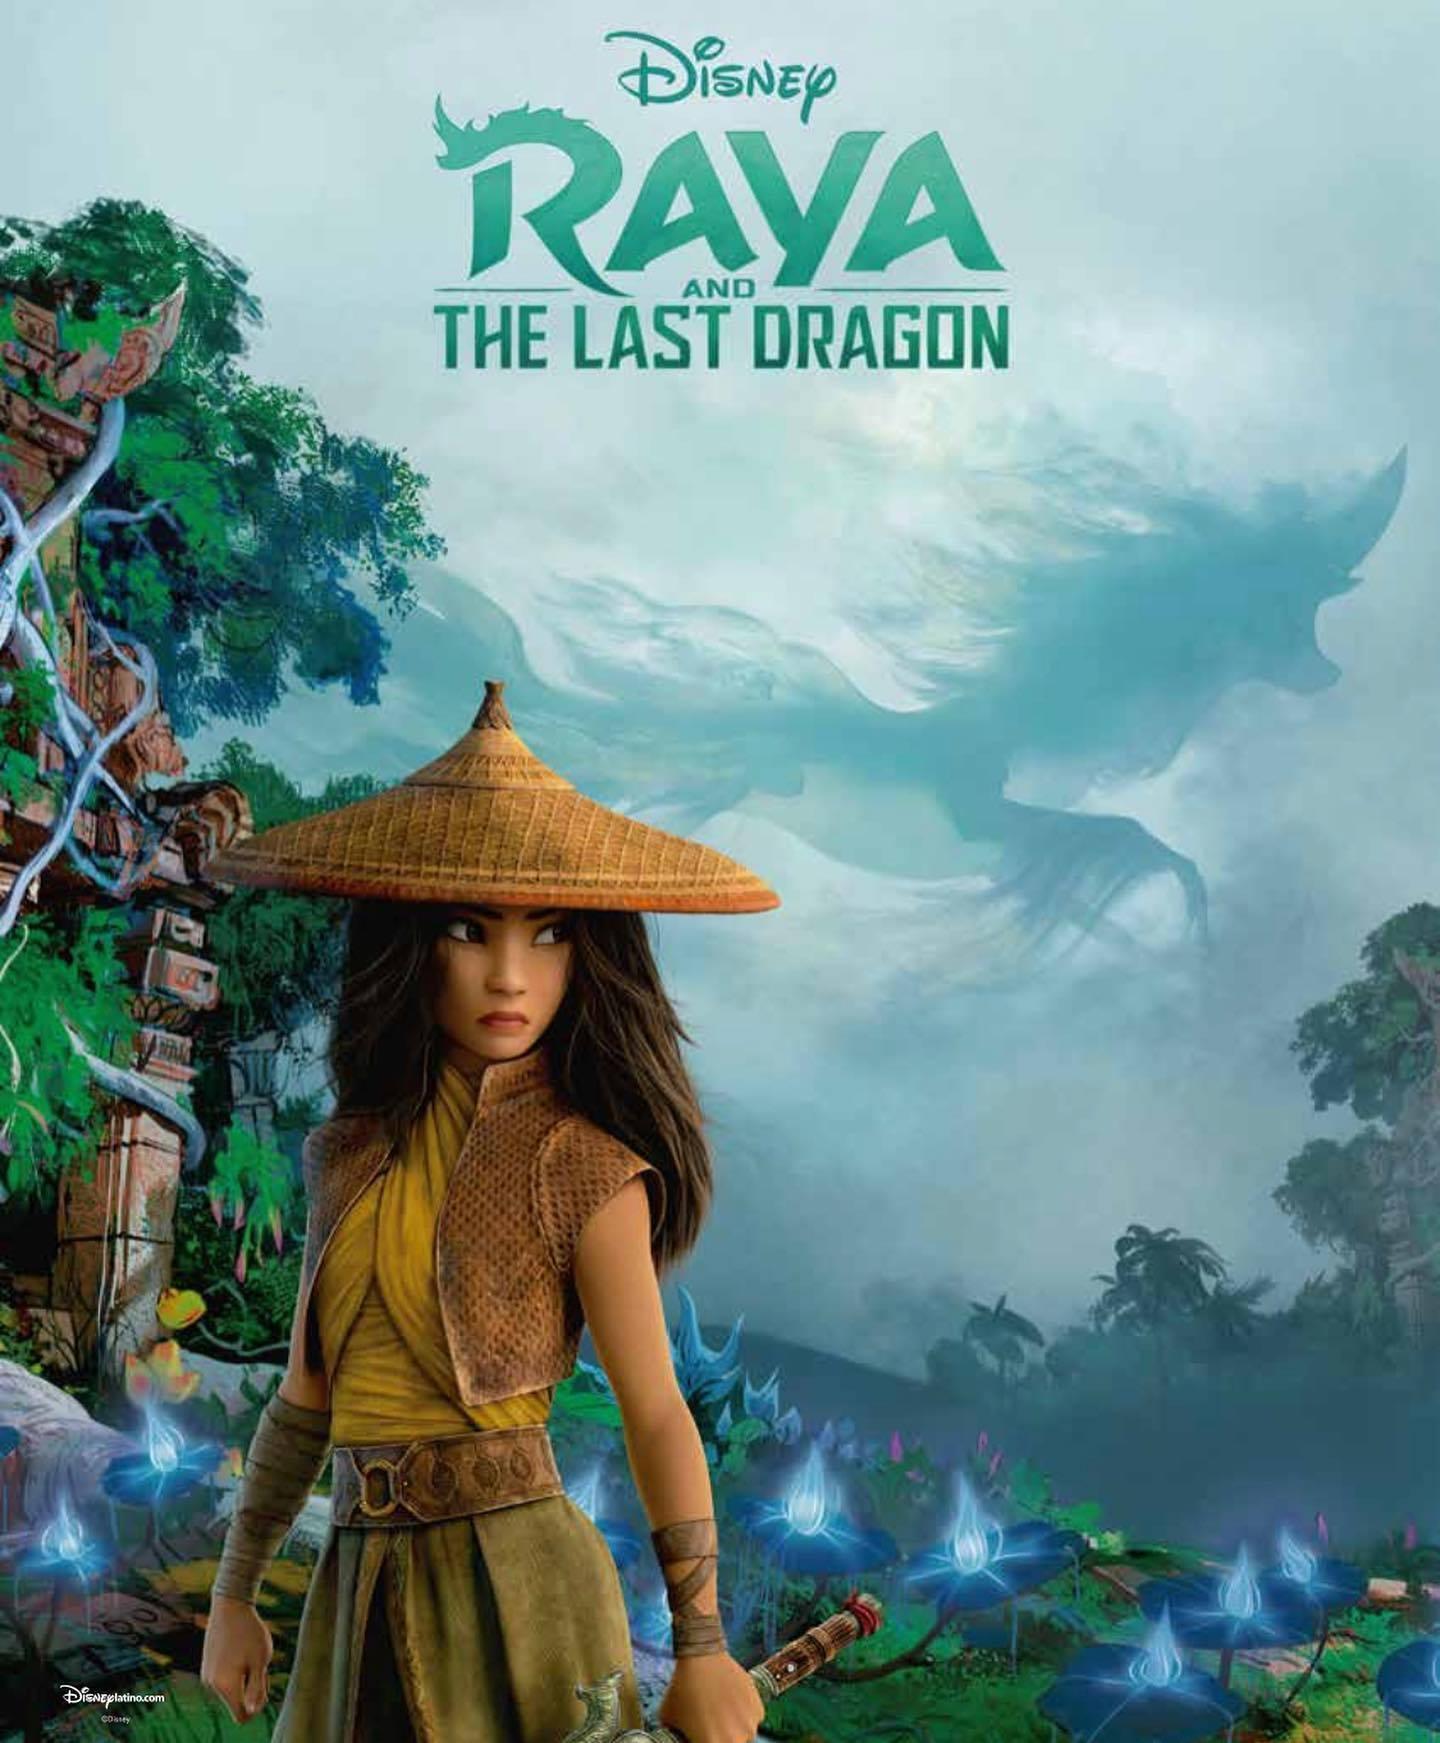 Raya et le Dernier Dragon [Walt Disney - 2021] - Page 4 EdtrxhzXoAEni6Y?format=png&name=large